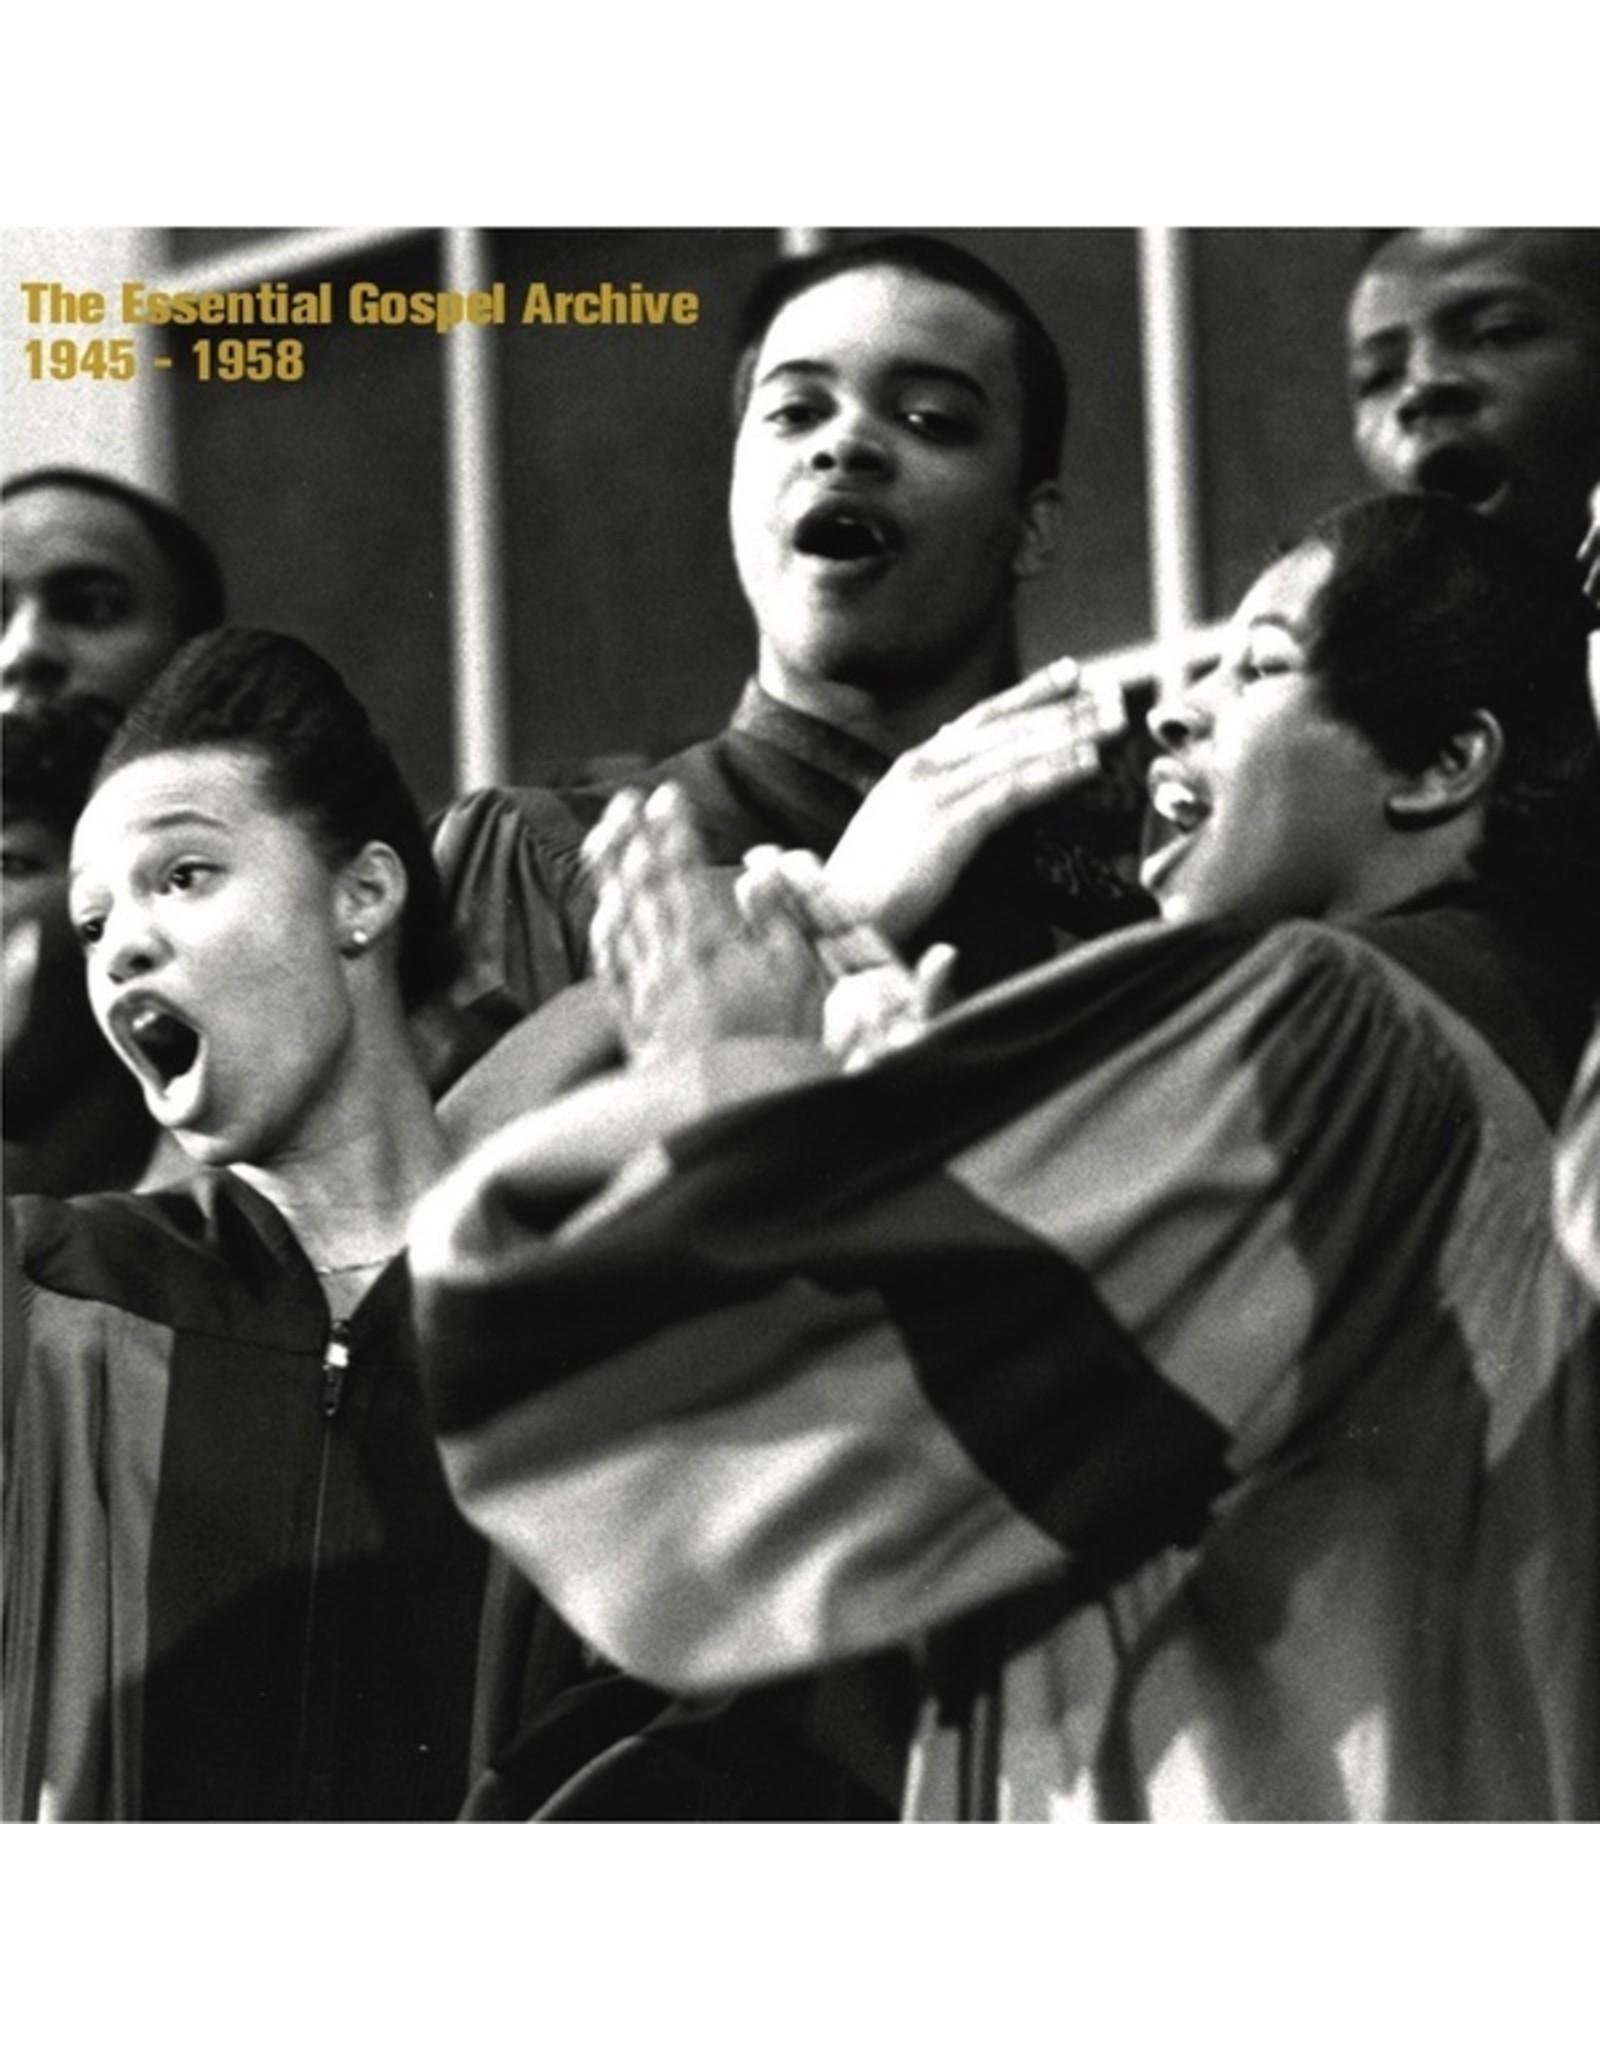 New Vinyl Various - The Essential Gospel Archive 1945-1958 LP